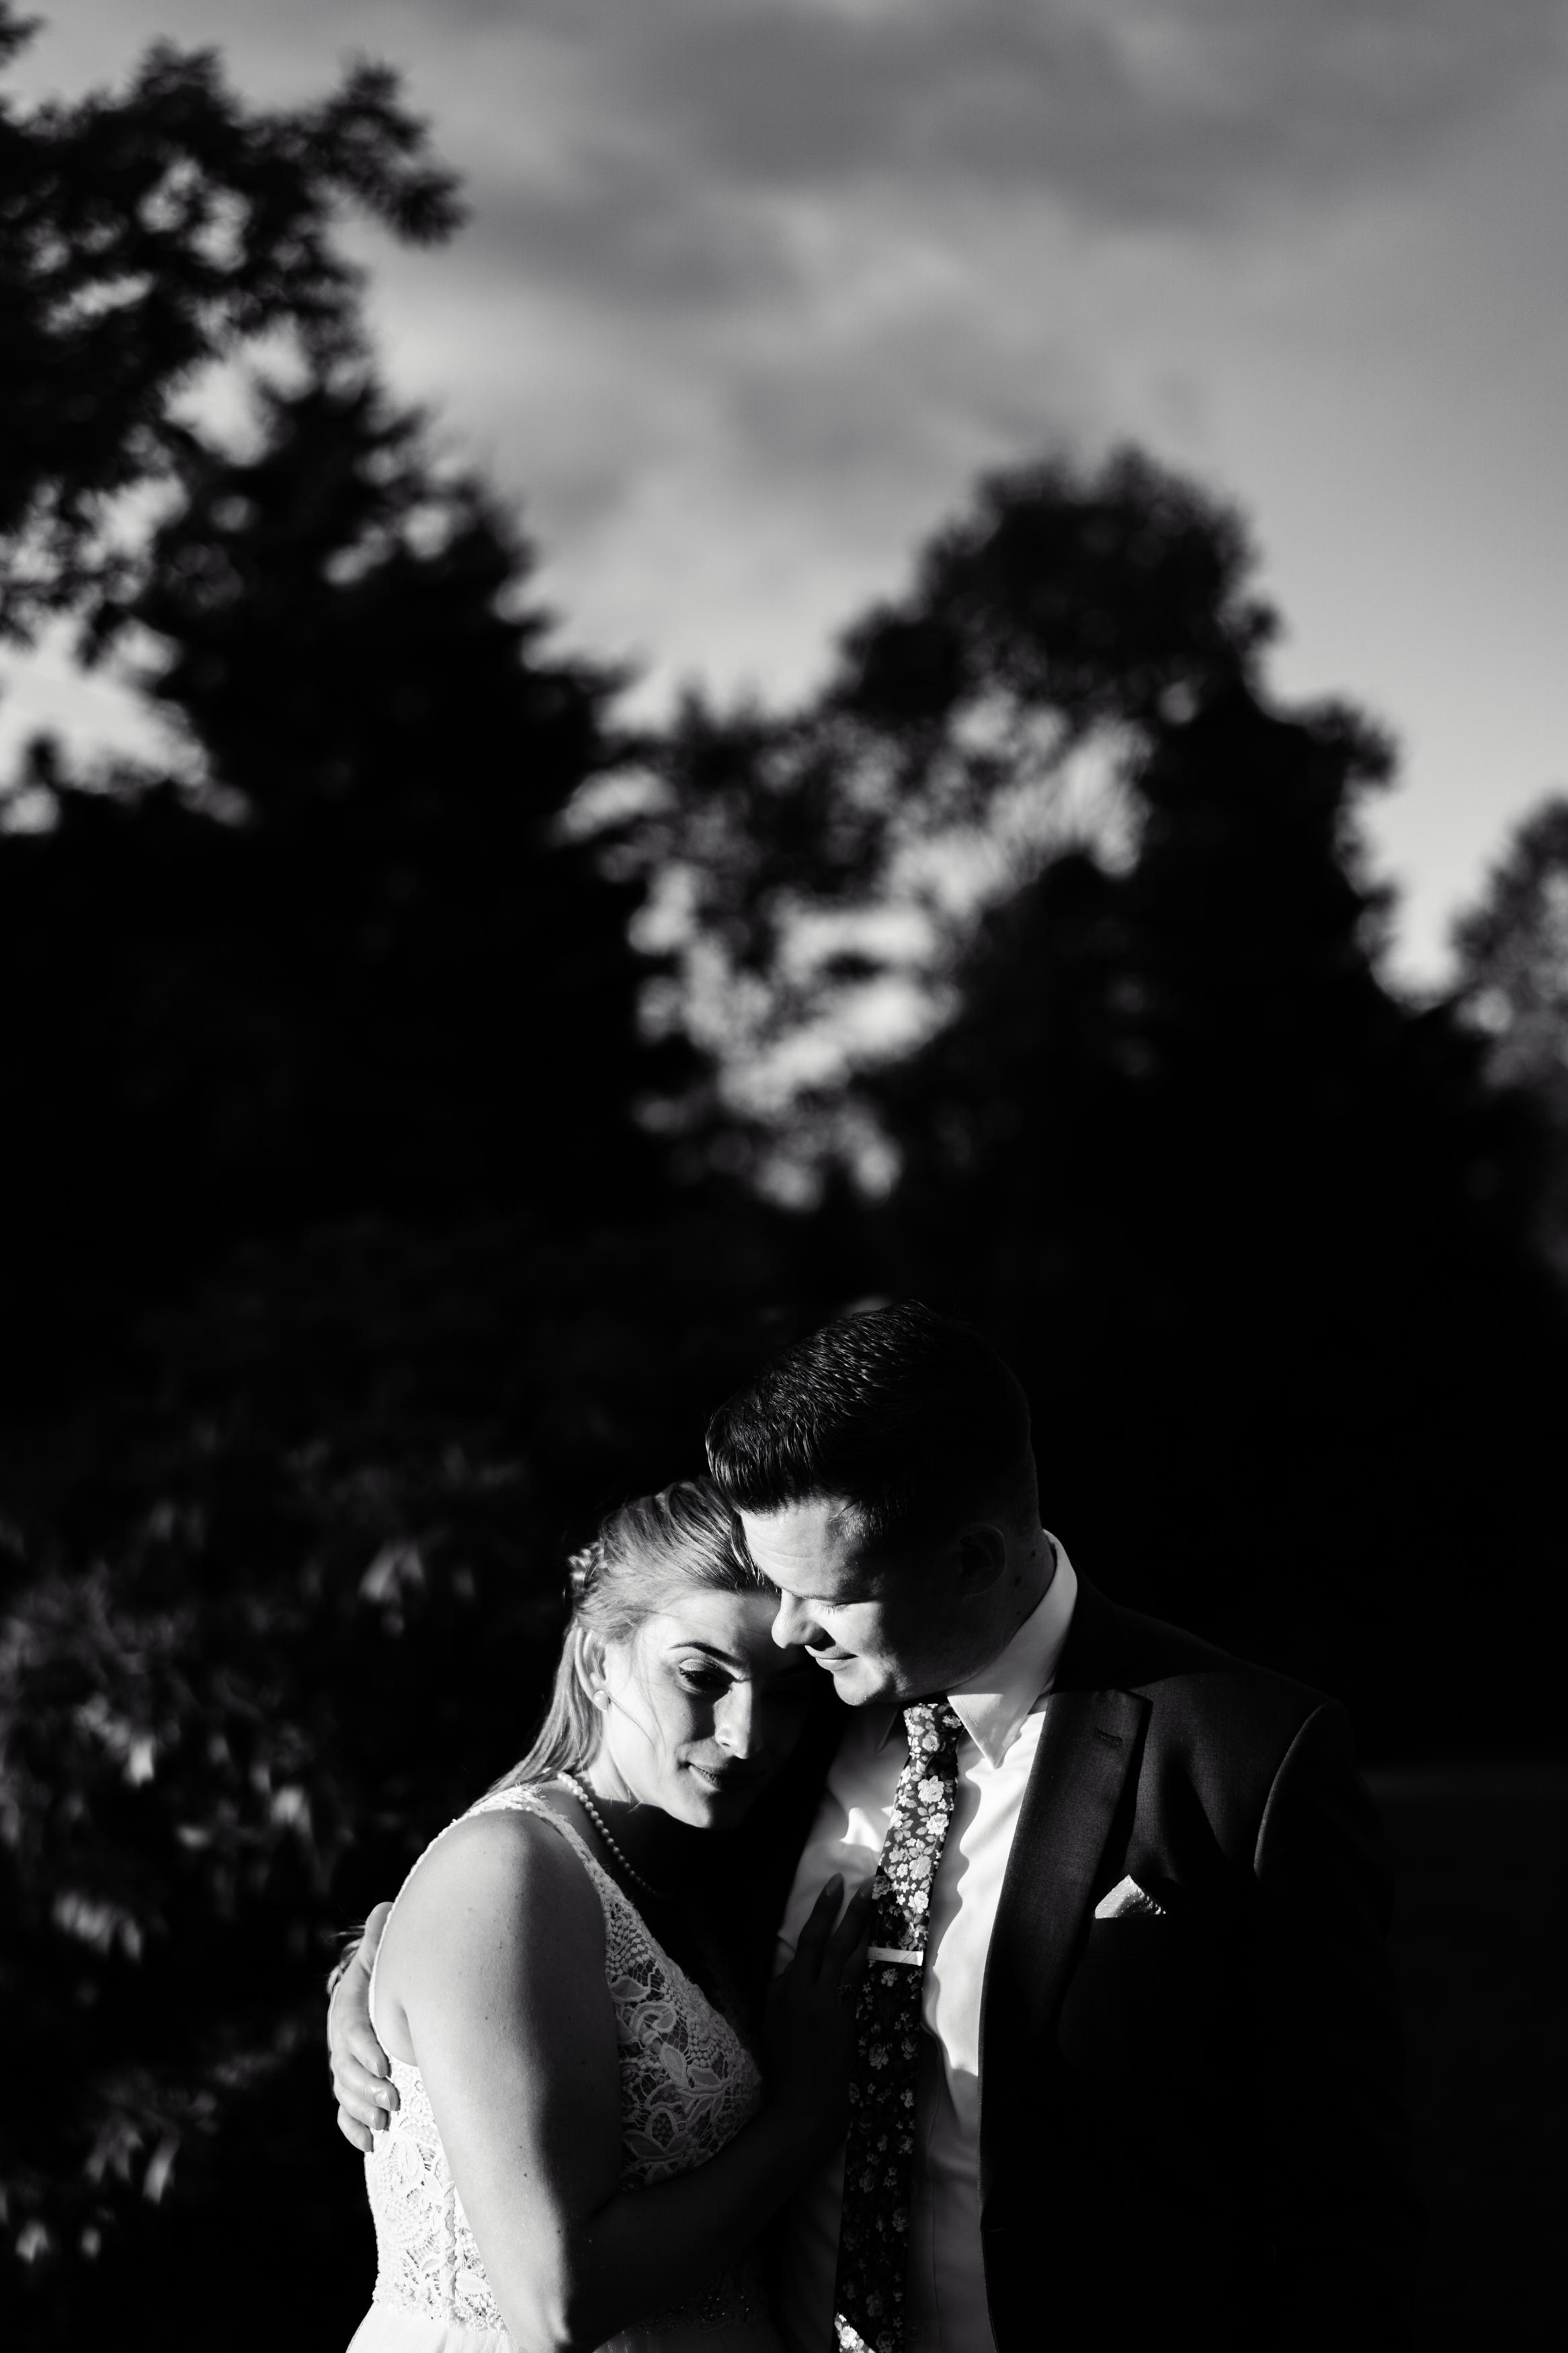 Janelle-Mitch-Halifax-Wedding-Nova-Scotia-Photography (133 of 163).jpg